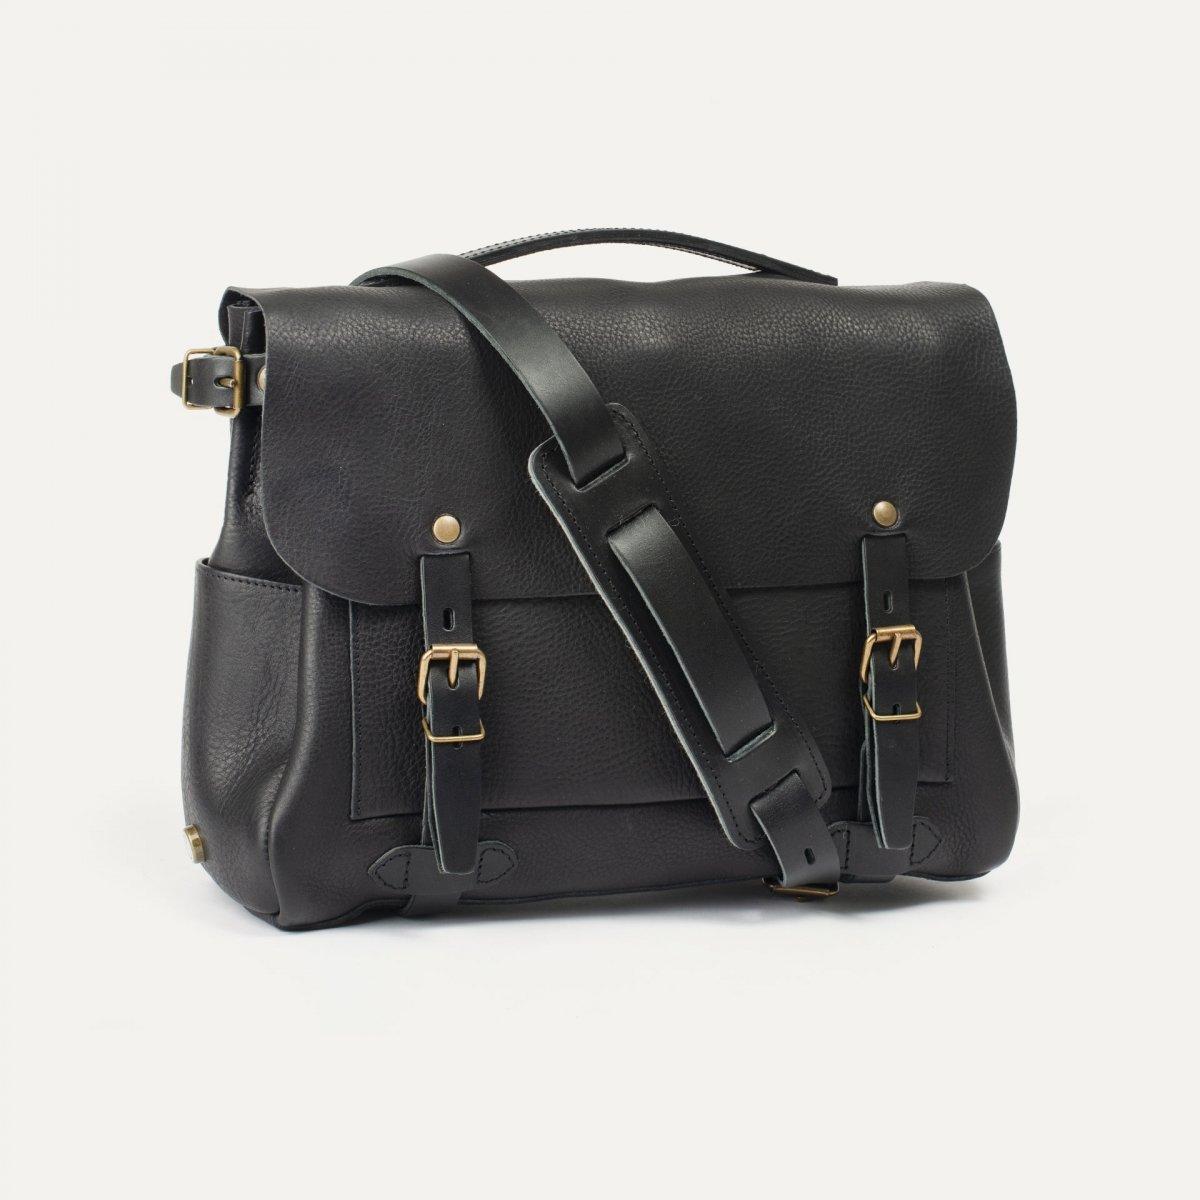 Postman bag Éclair M - Black (image n°2)